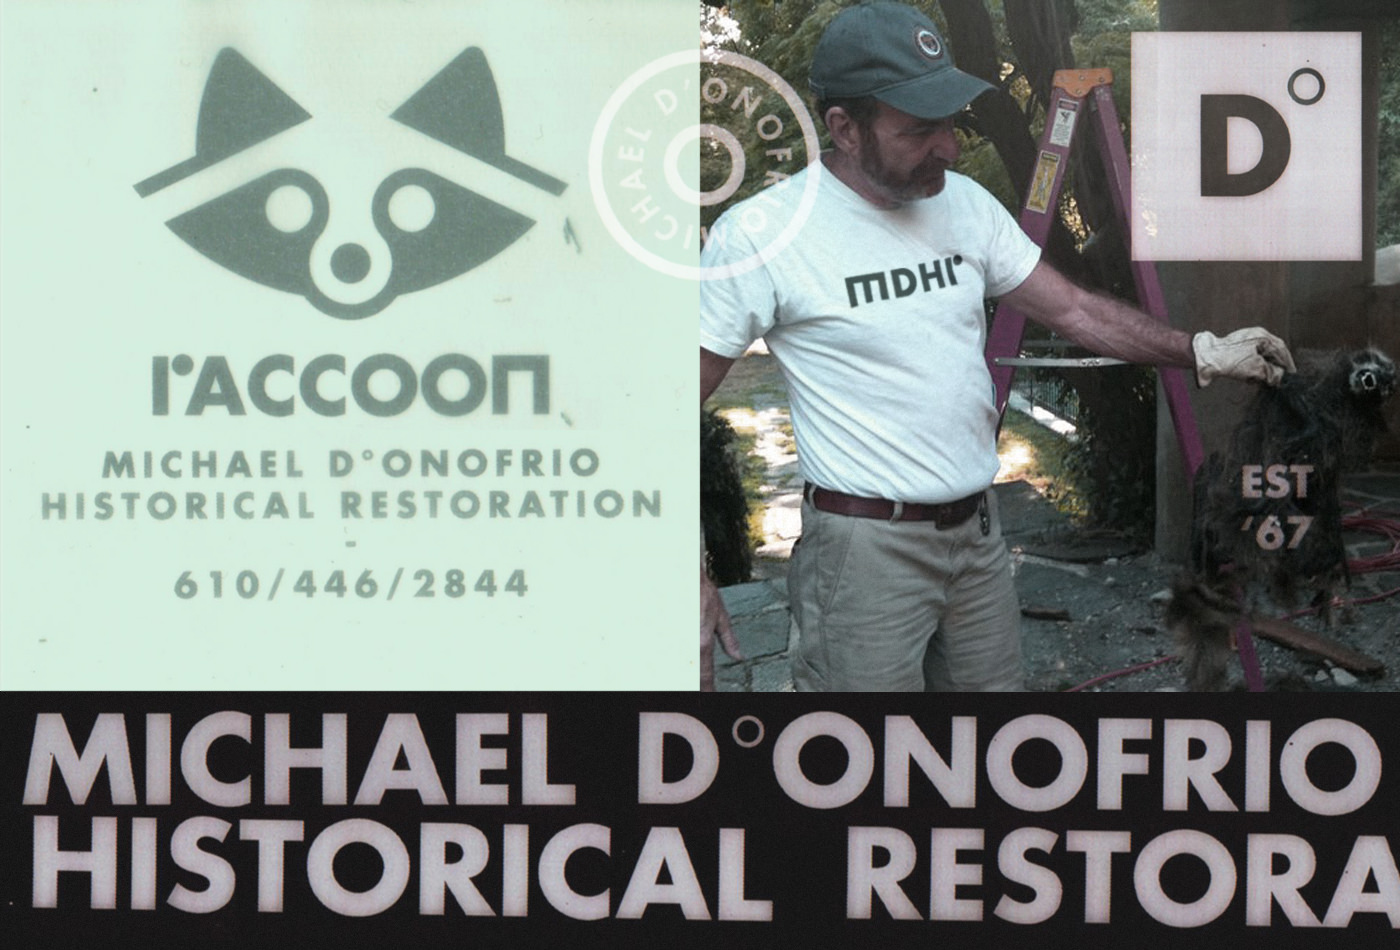 mdhr-historical-restoration-donofrio-michaeldonofrio-vacaliebres-markdonofrio-philly-mainline